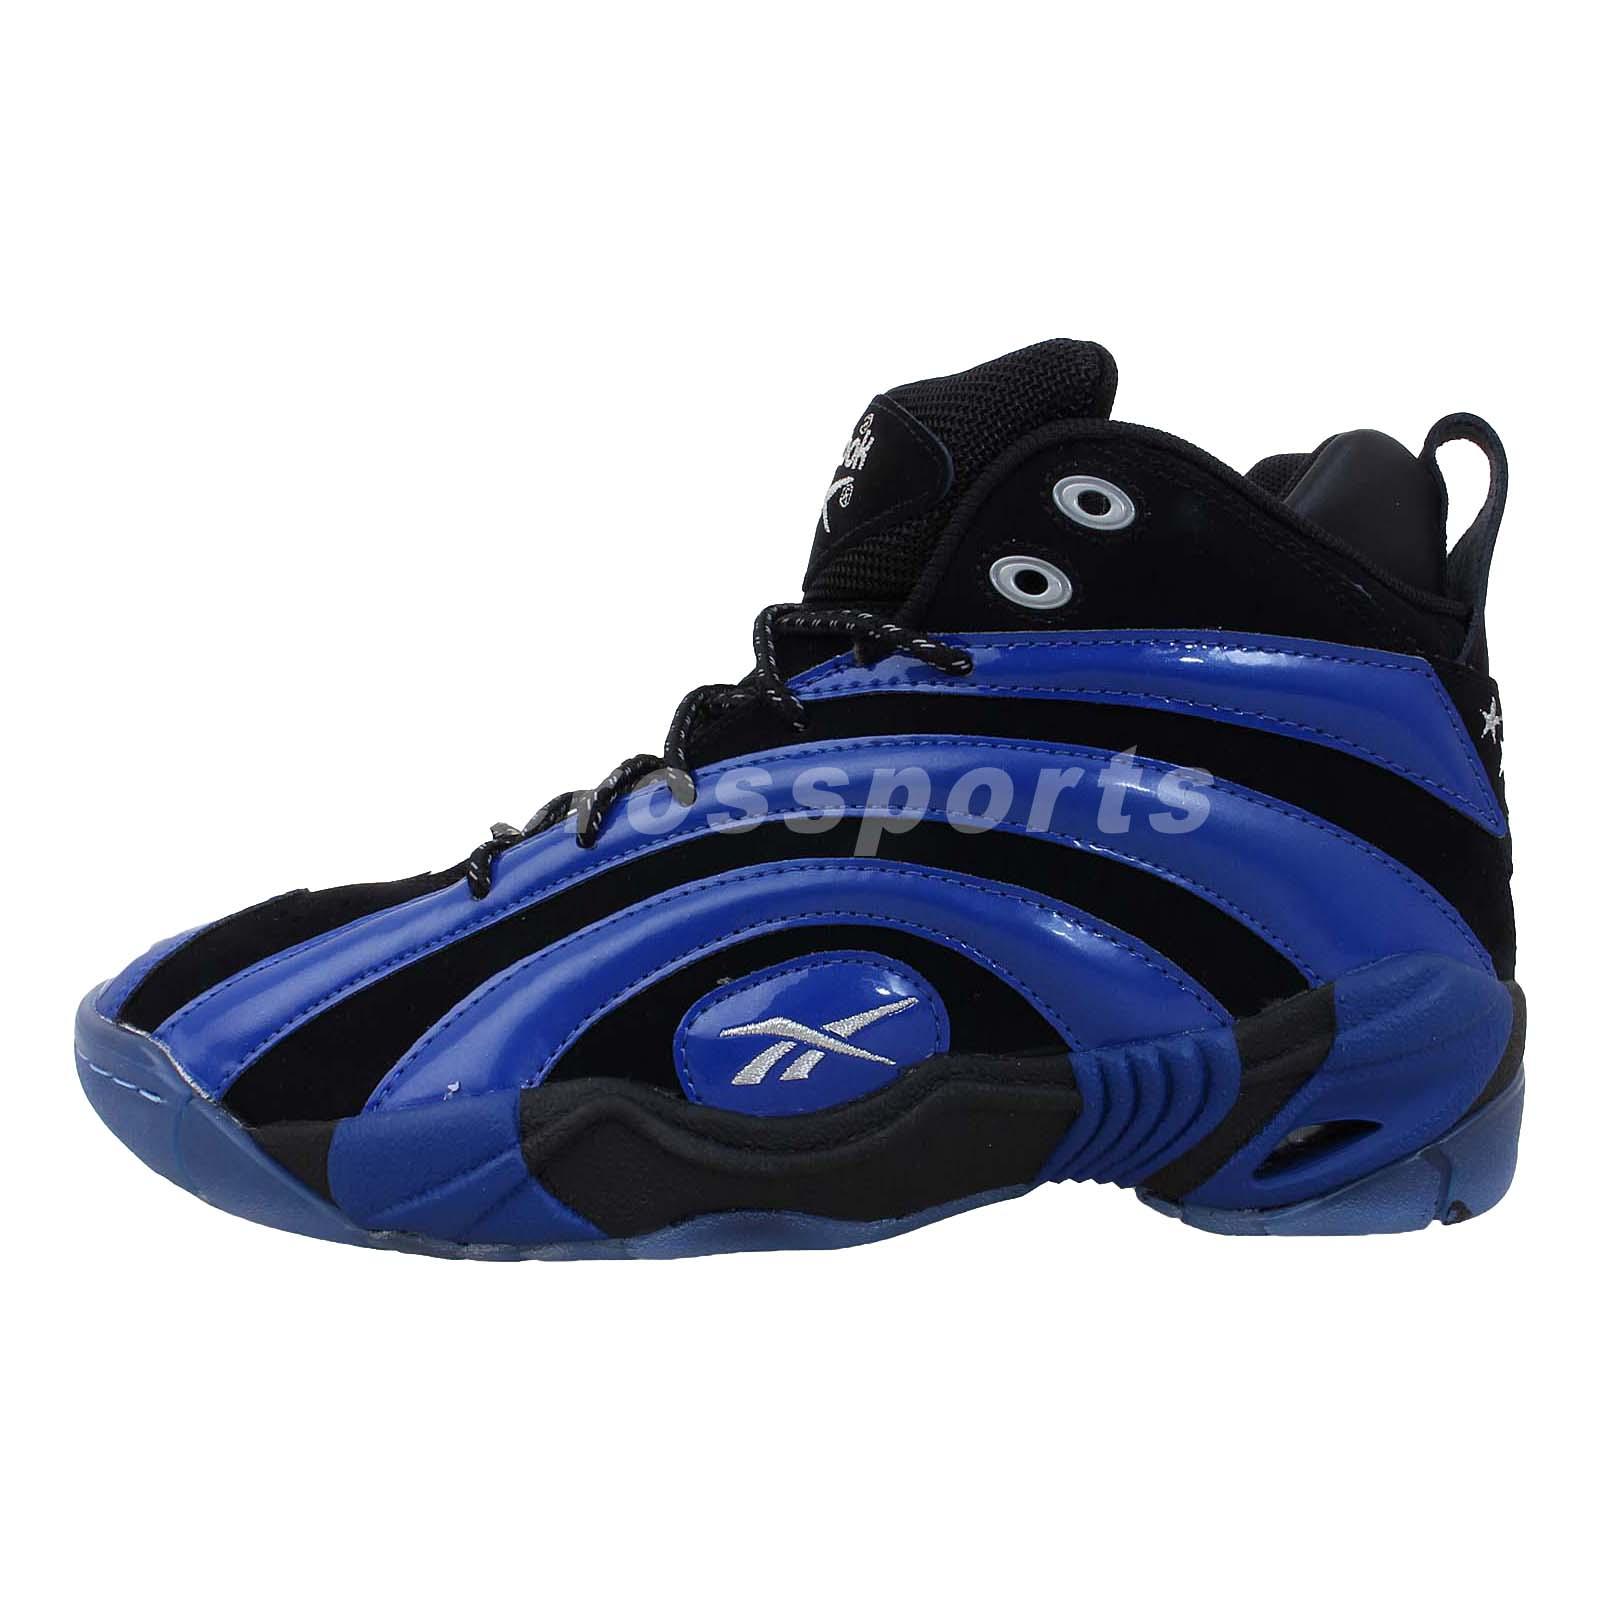 Reebok Men S Shoe Size  Made In Vietnam